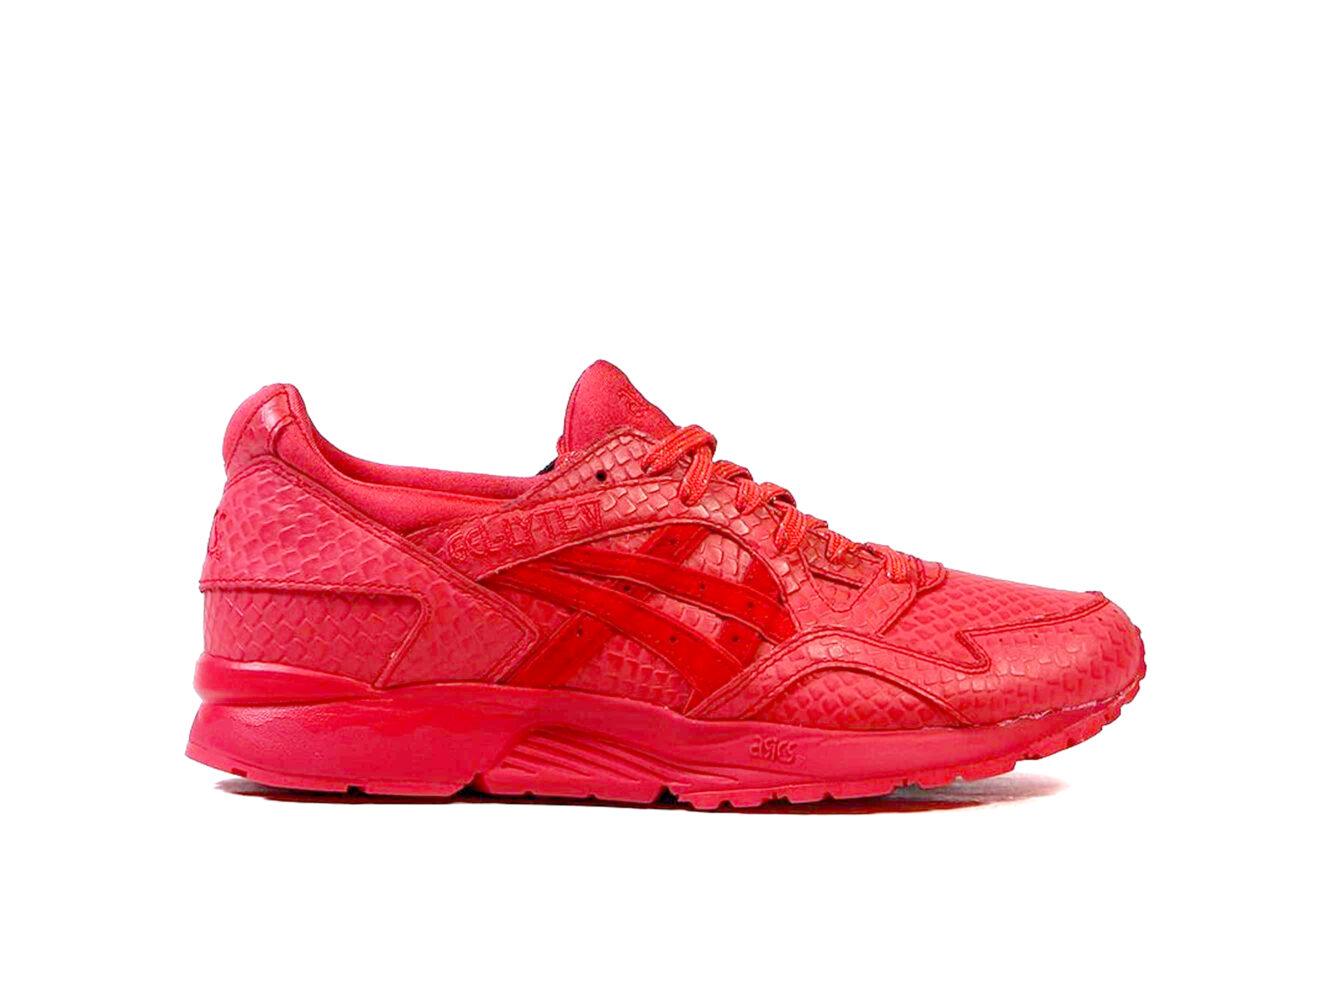 asics gel-lyte V red mamba pack h51ek_2727 купить